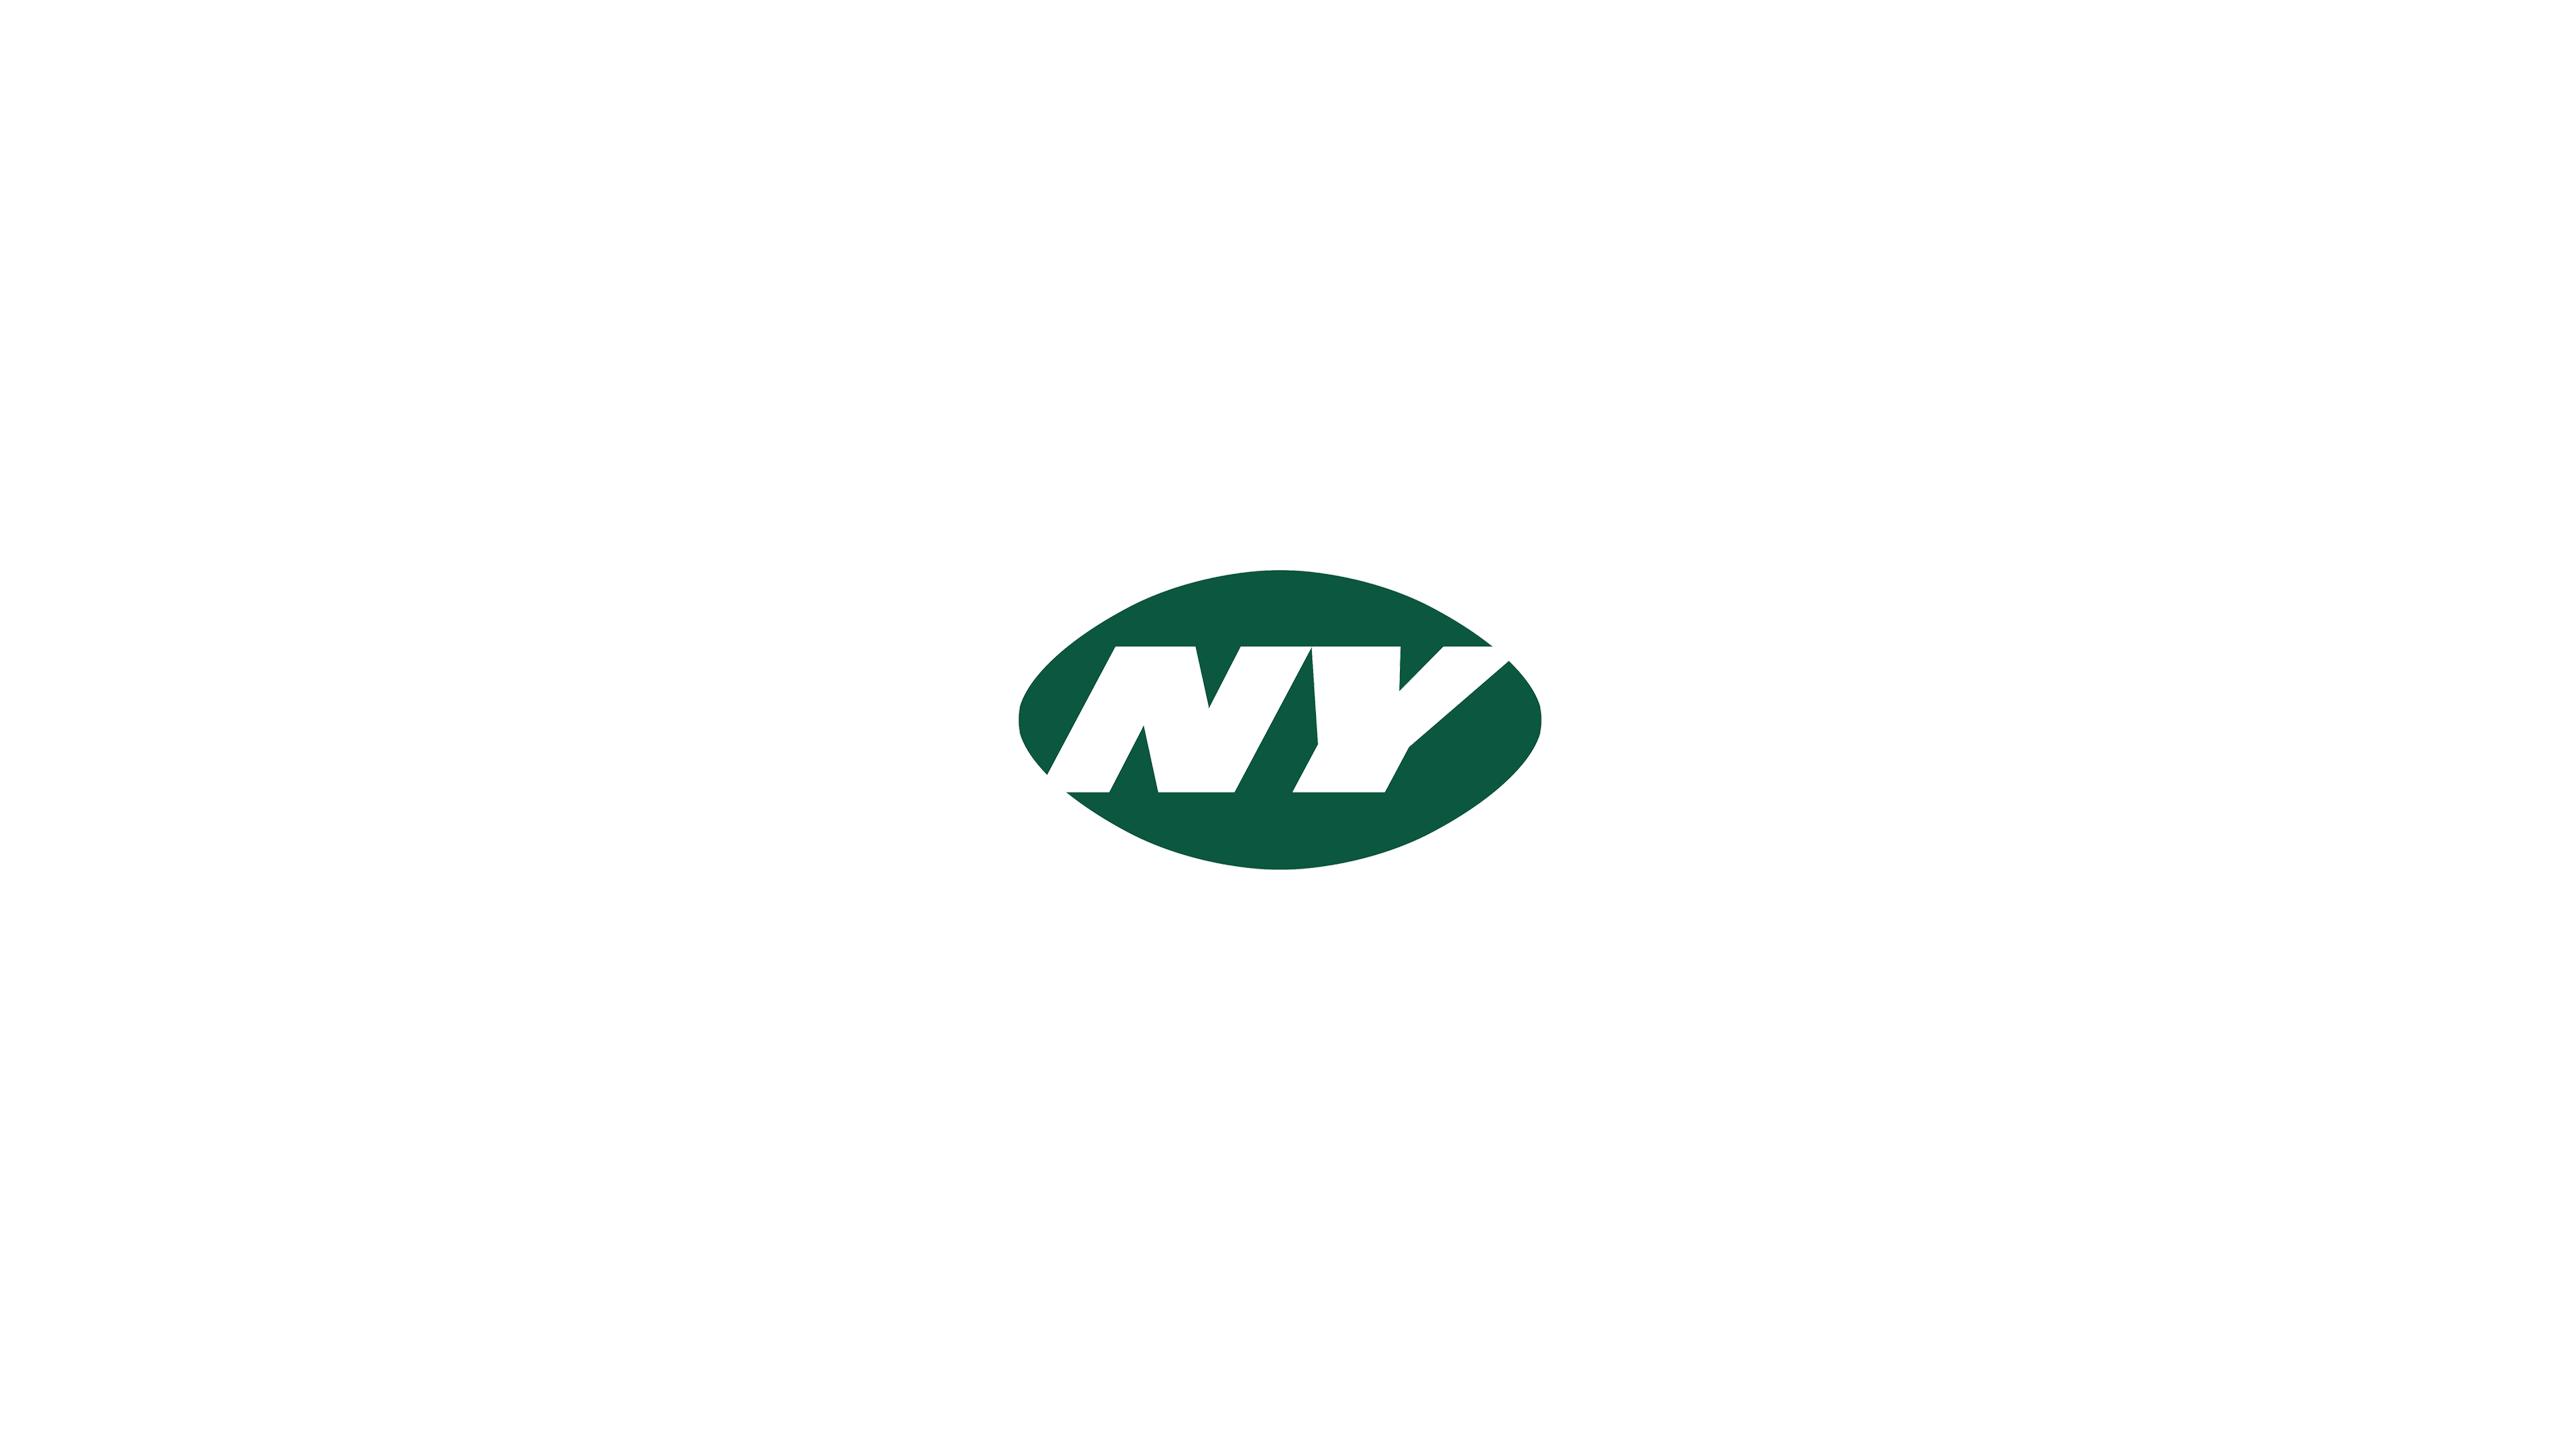 New York Jets (Alternate)